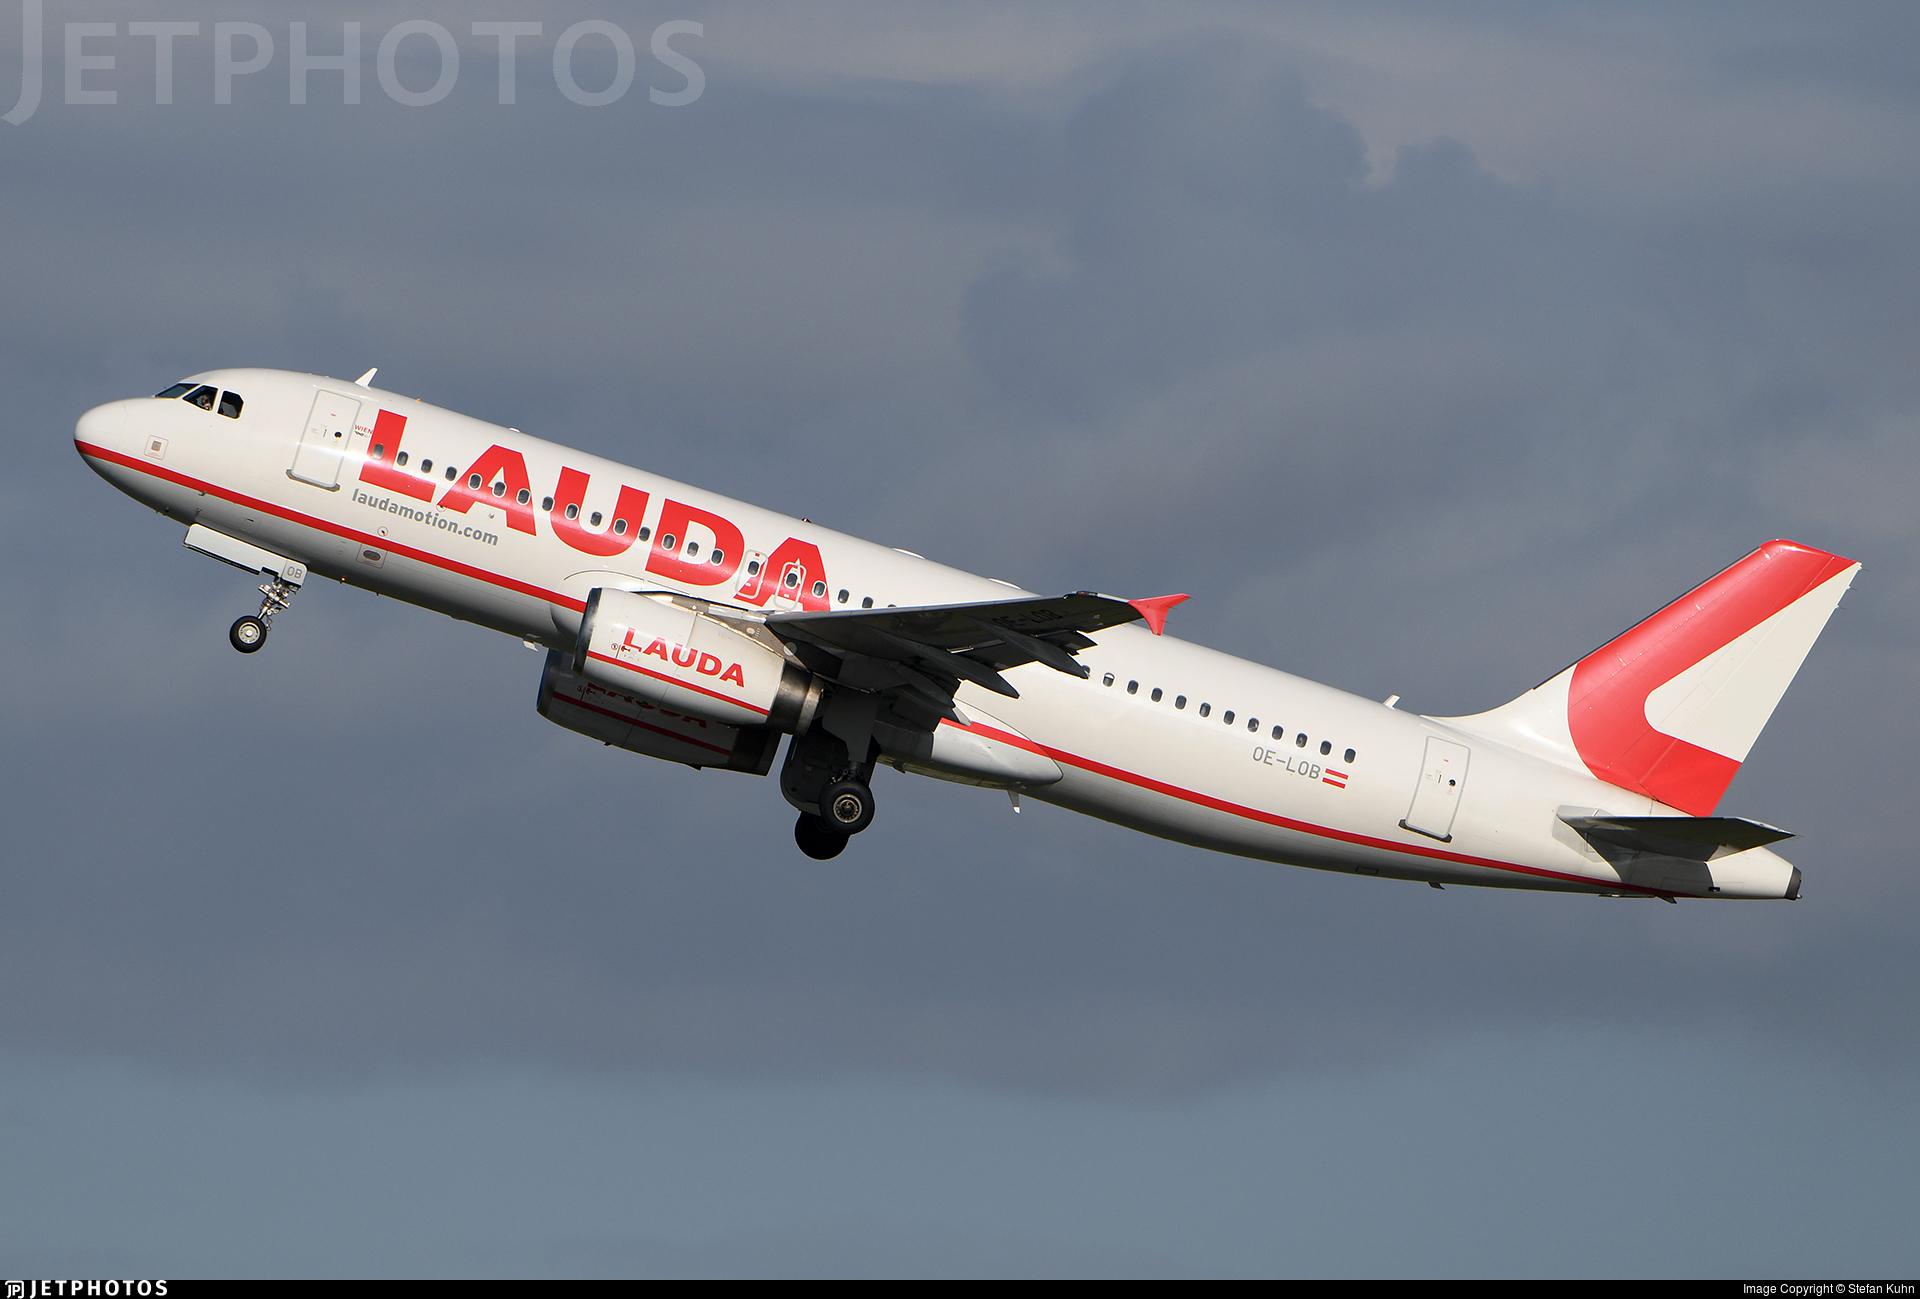 OE-LOB - Airbus A320-214 - LaudaMotion